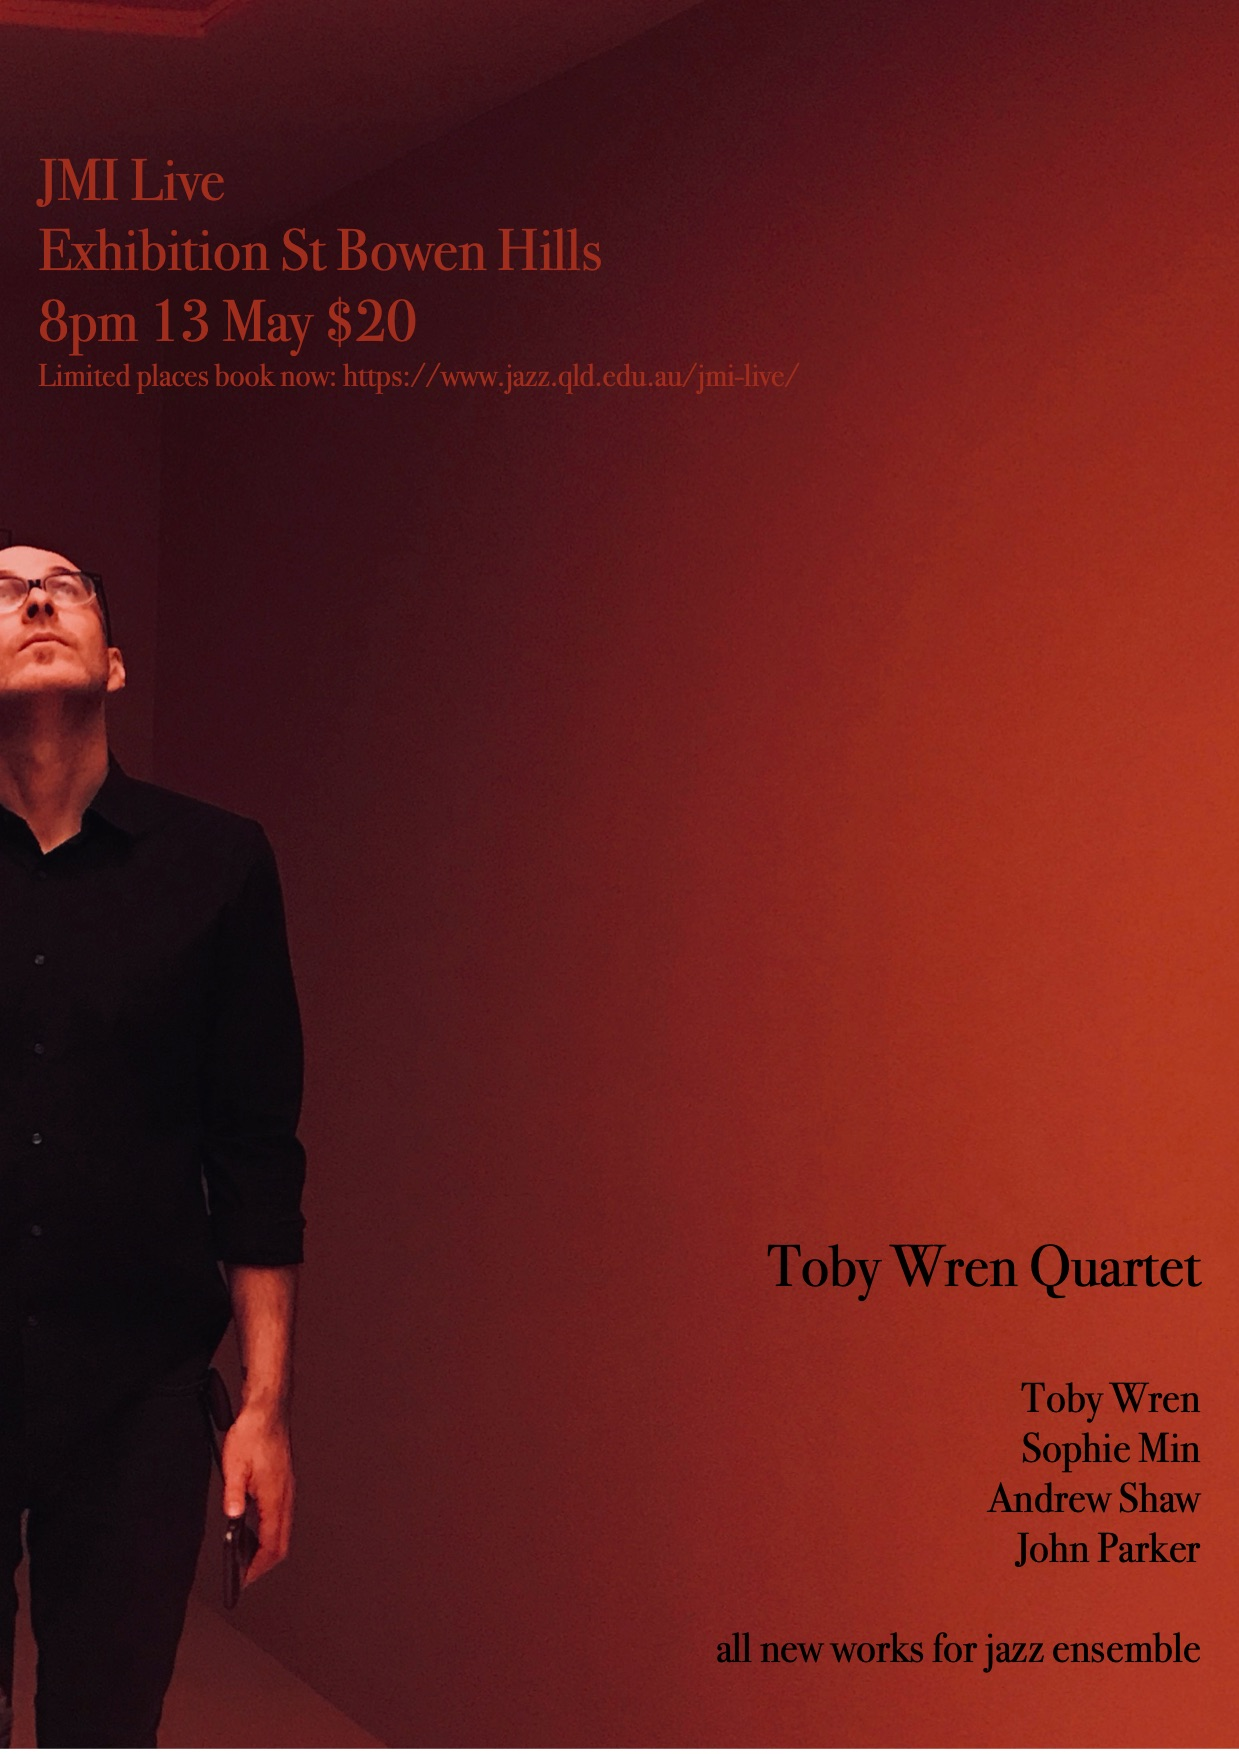 Toby Wren Quartet